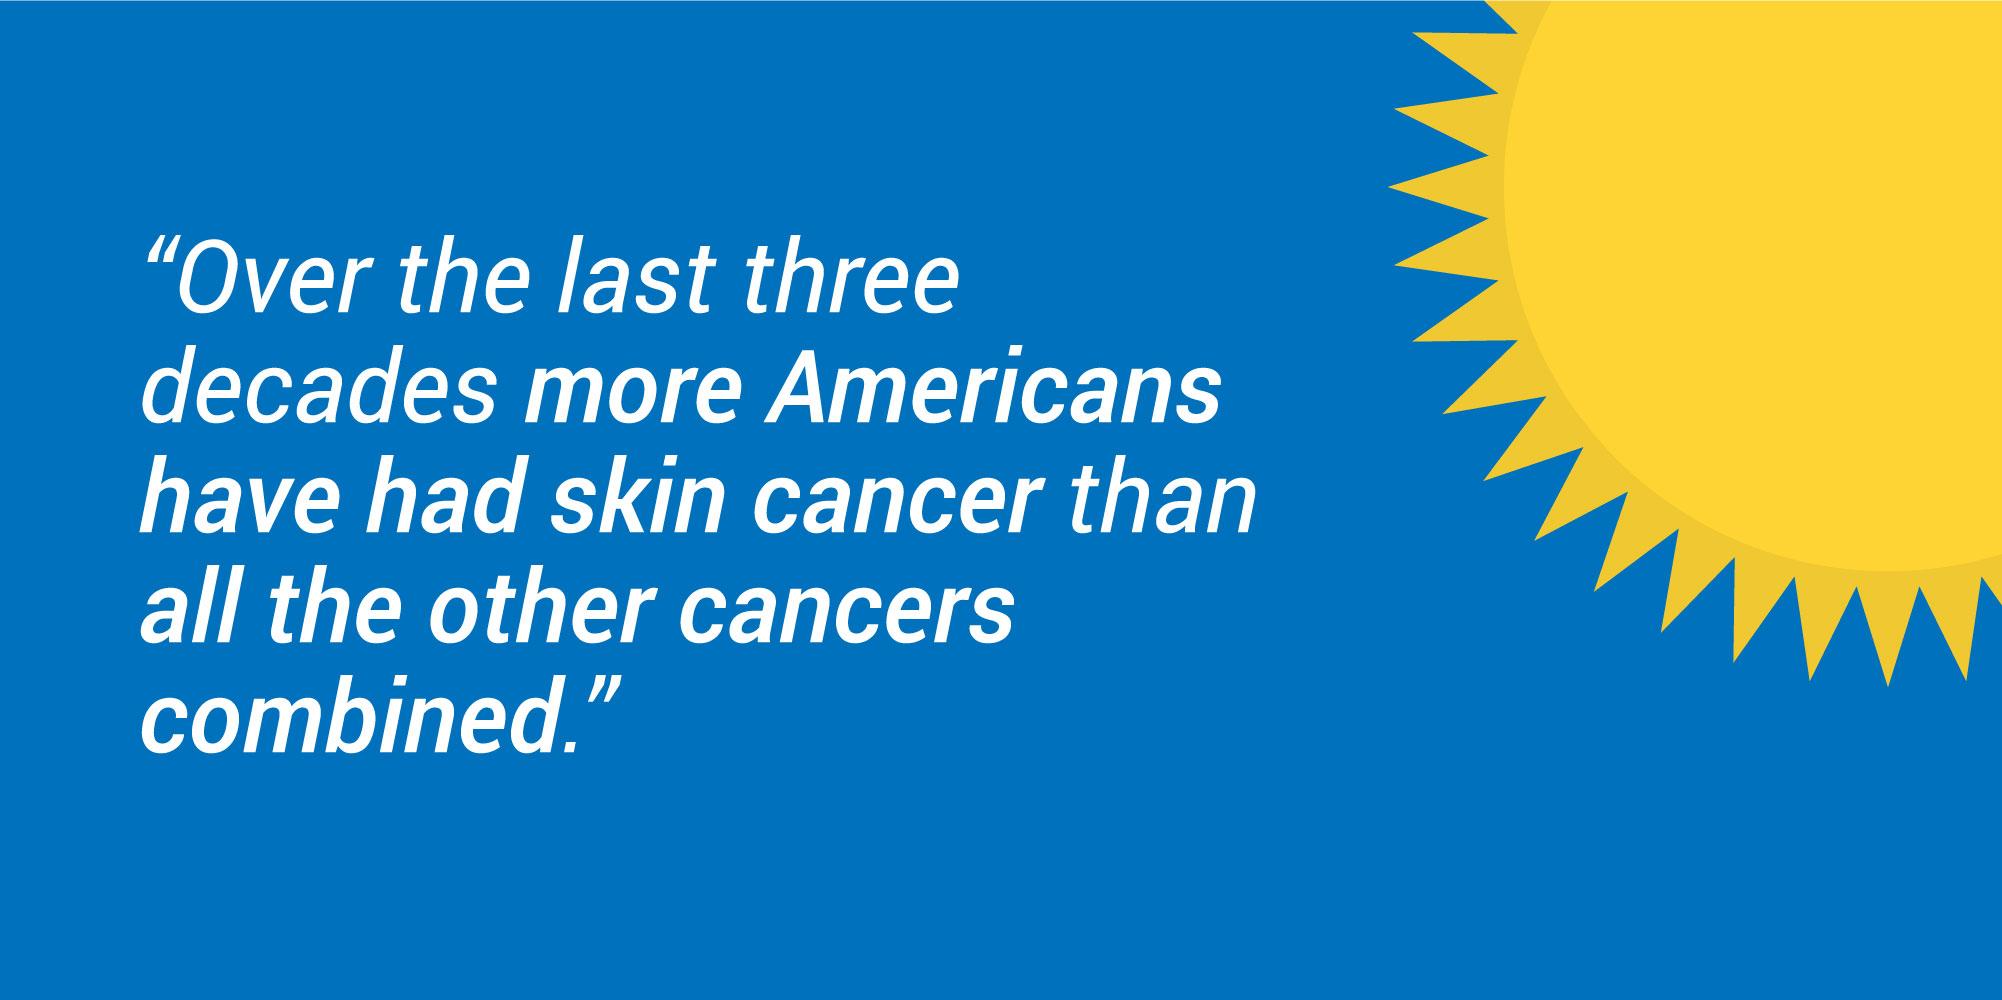 Skin-Cancer-Stats-for-Window-Film-Dealers